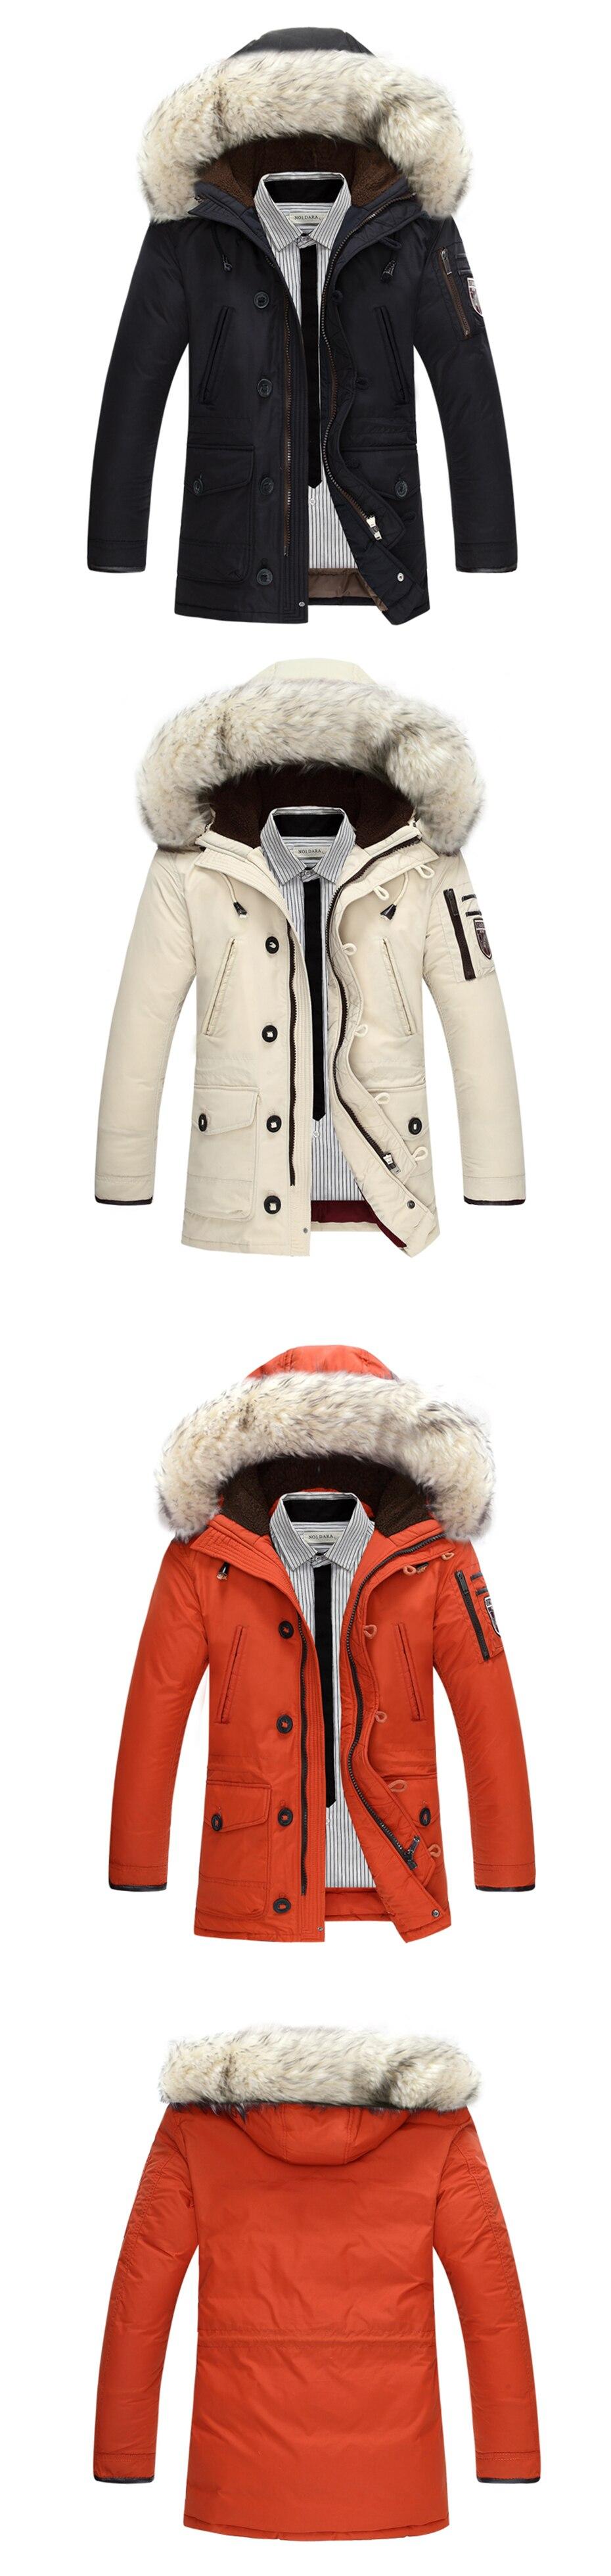 8082f380642 Asesmay Luxury Brand Winter Men Down Jackets Goose Down Mens White Parkas  With Fur Hood Men Deniem Russian ...